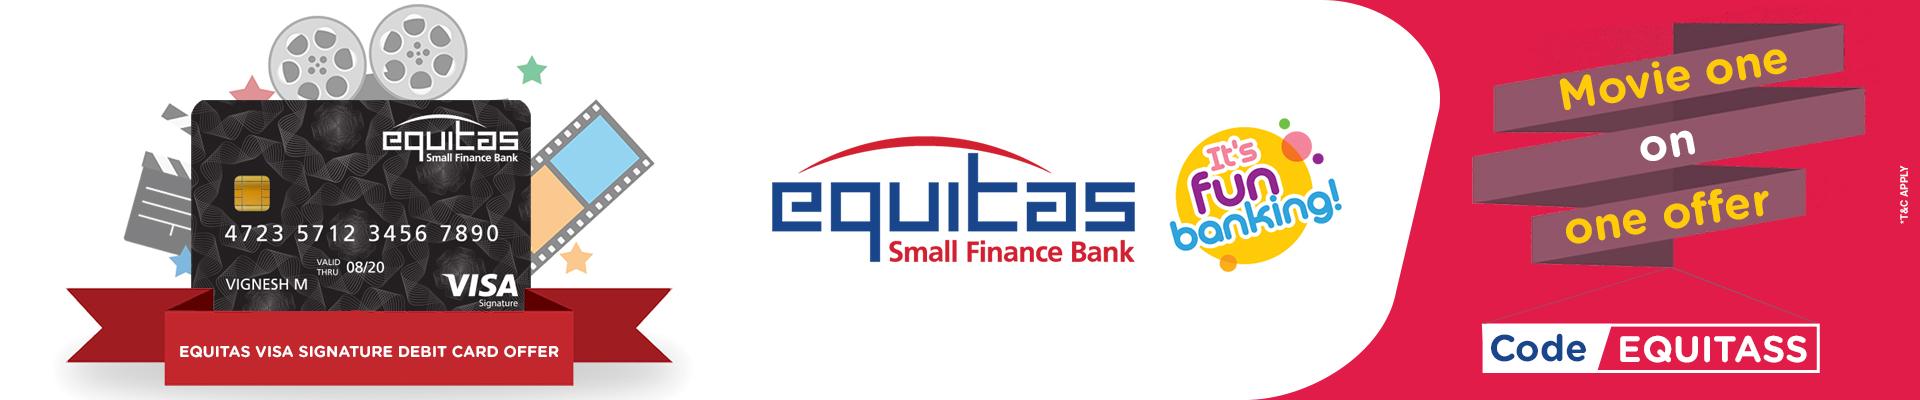 Equitas -Visa Signature Debit Card Banner